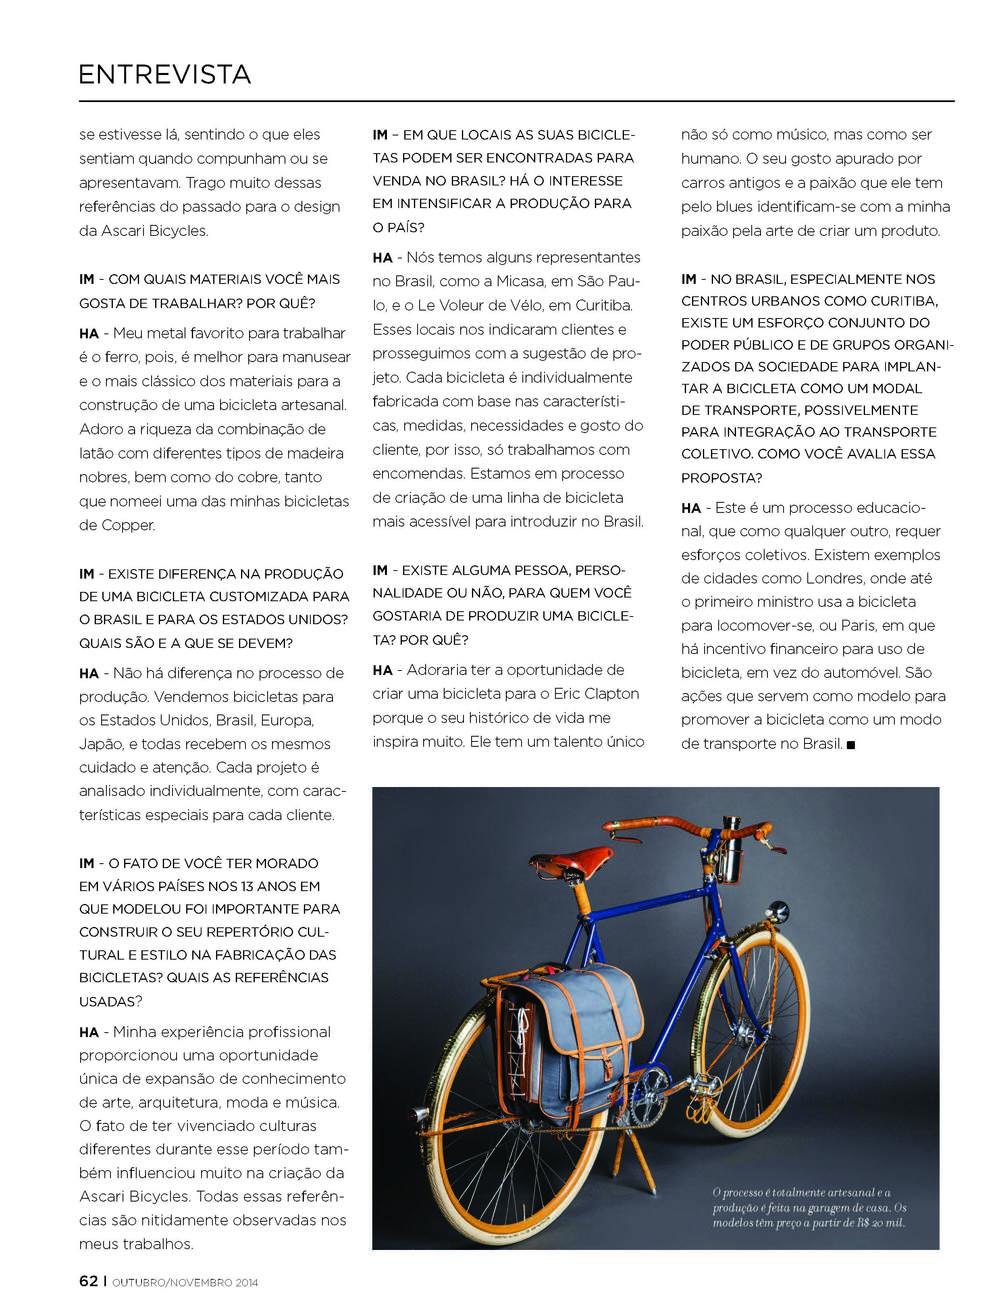 Imovel Magazine_Page_3.jpg